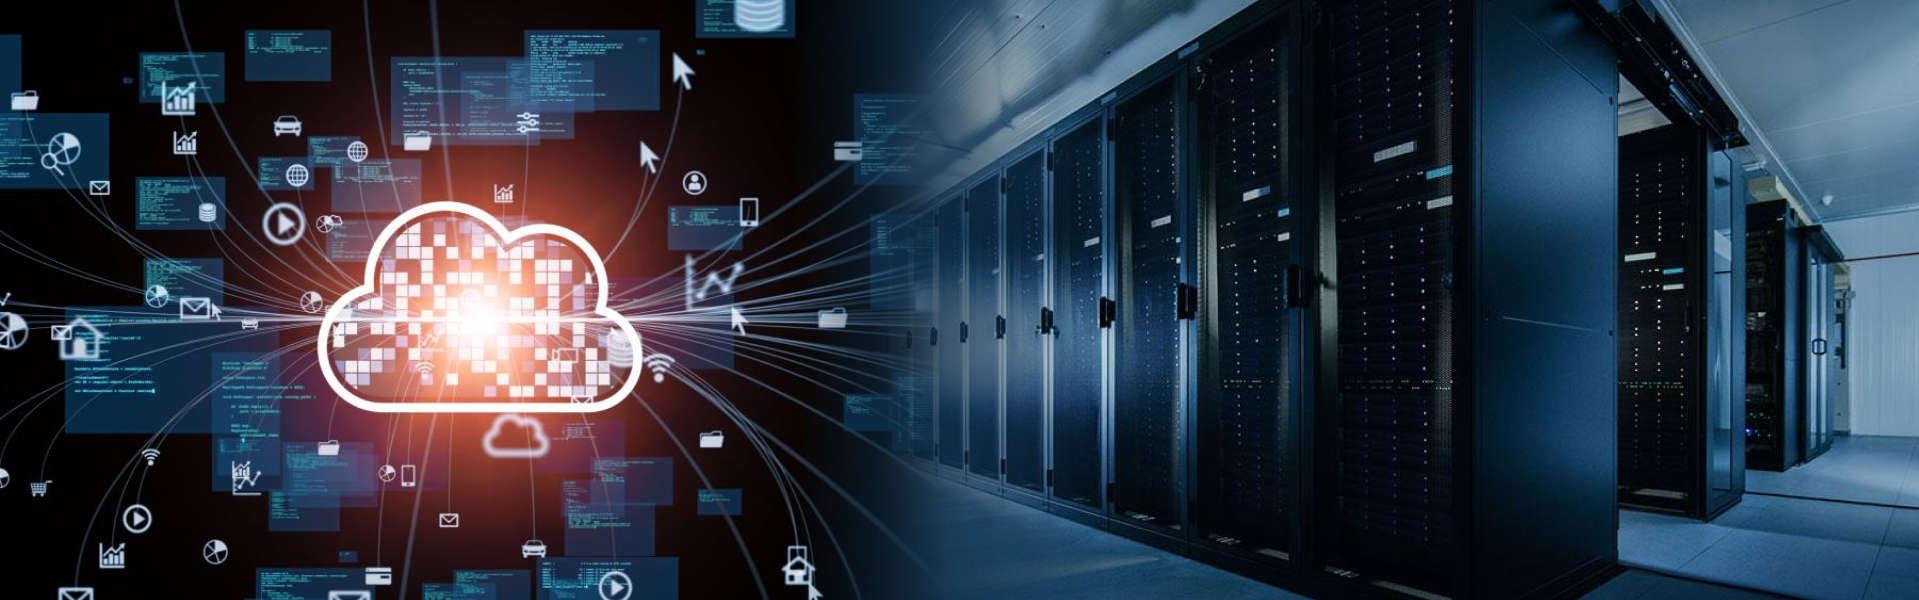 iot and edge cloud computing